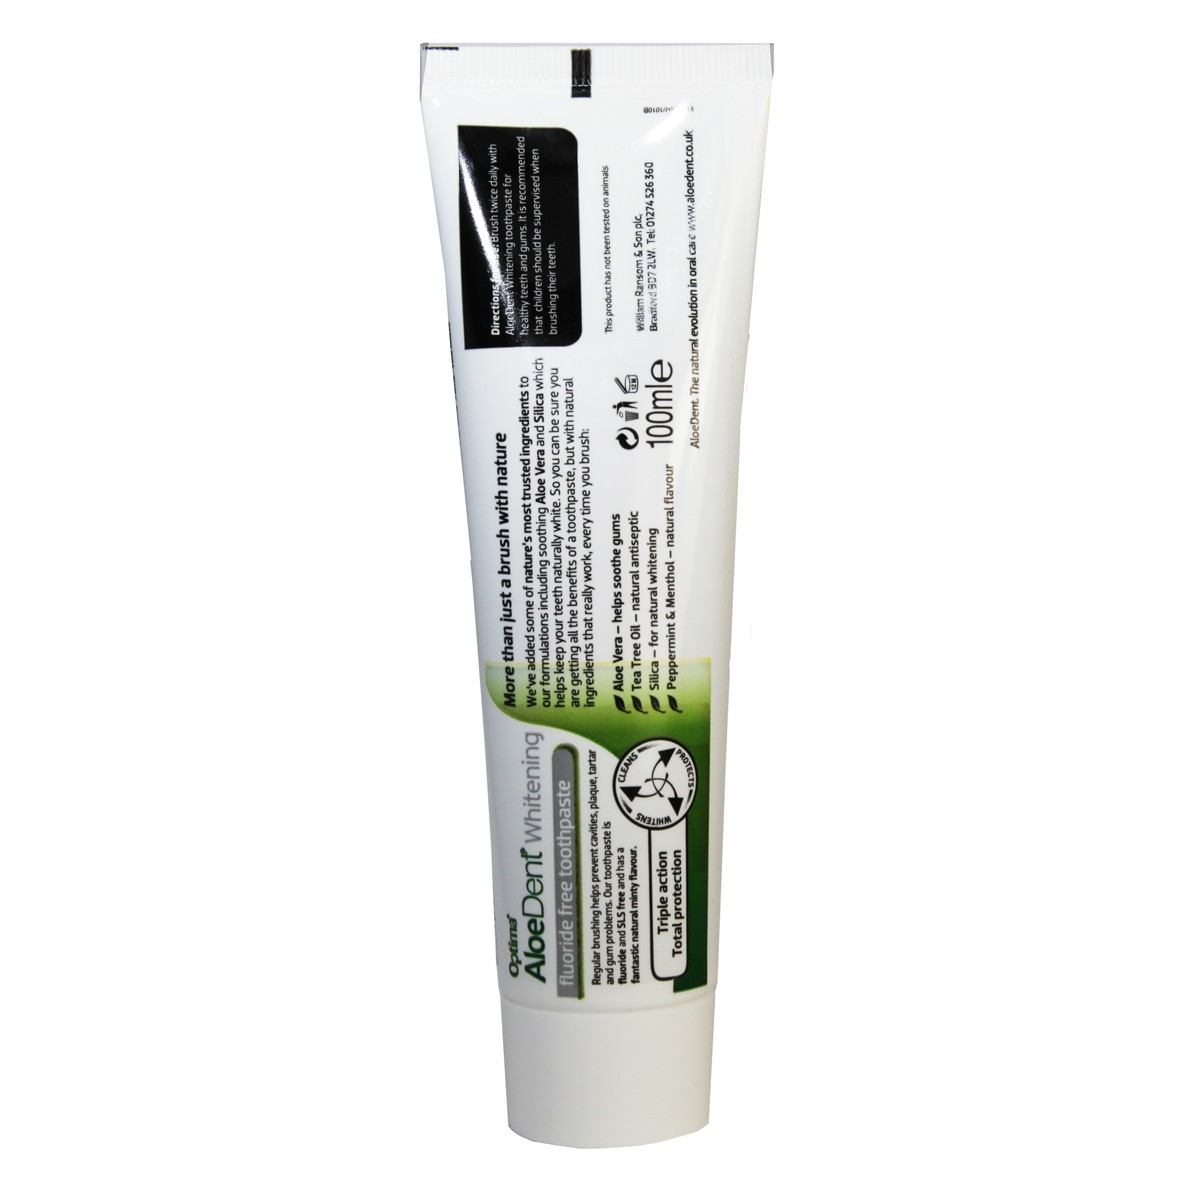 AloeDent Whitening Toothpaste Fluoride Free